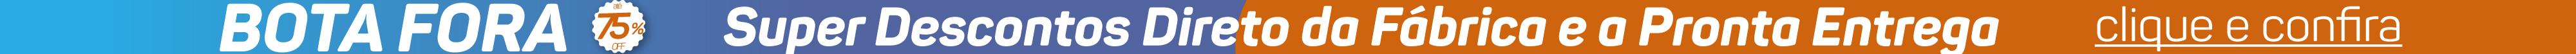 banner desktop-faixa